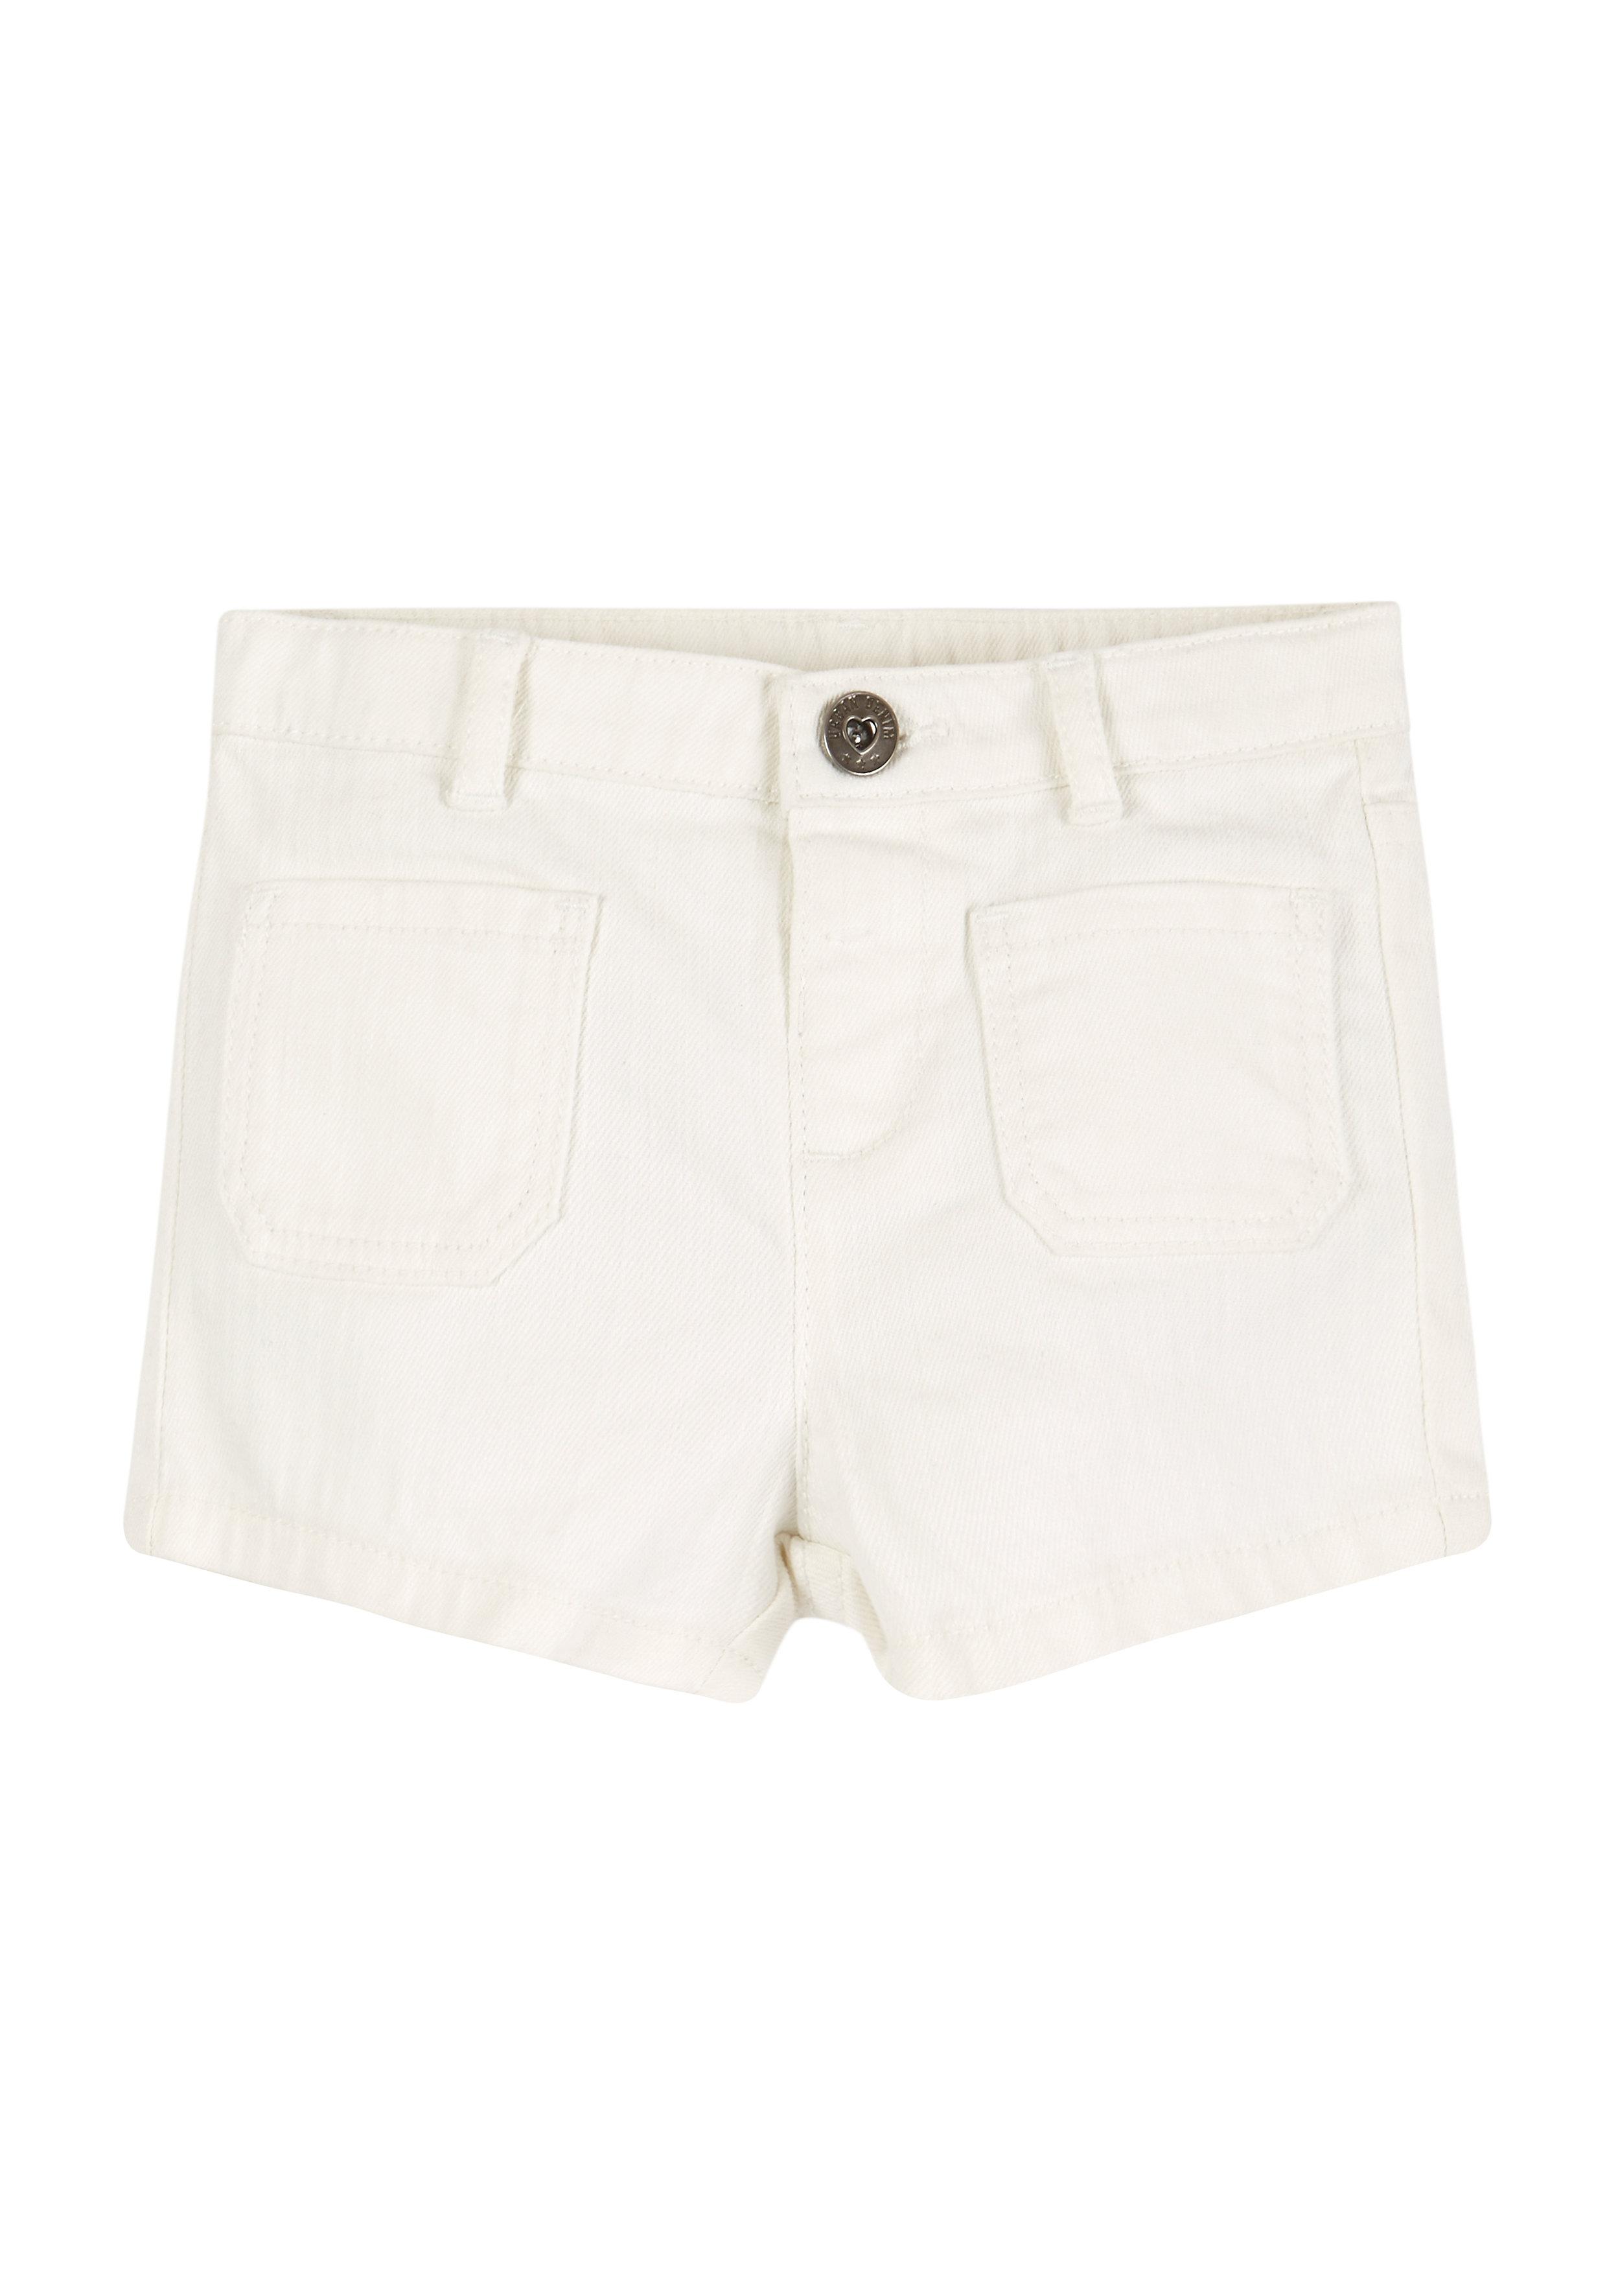 Mothercare | Girls Denim Shorts - White